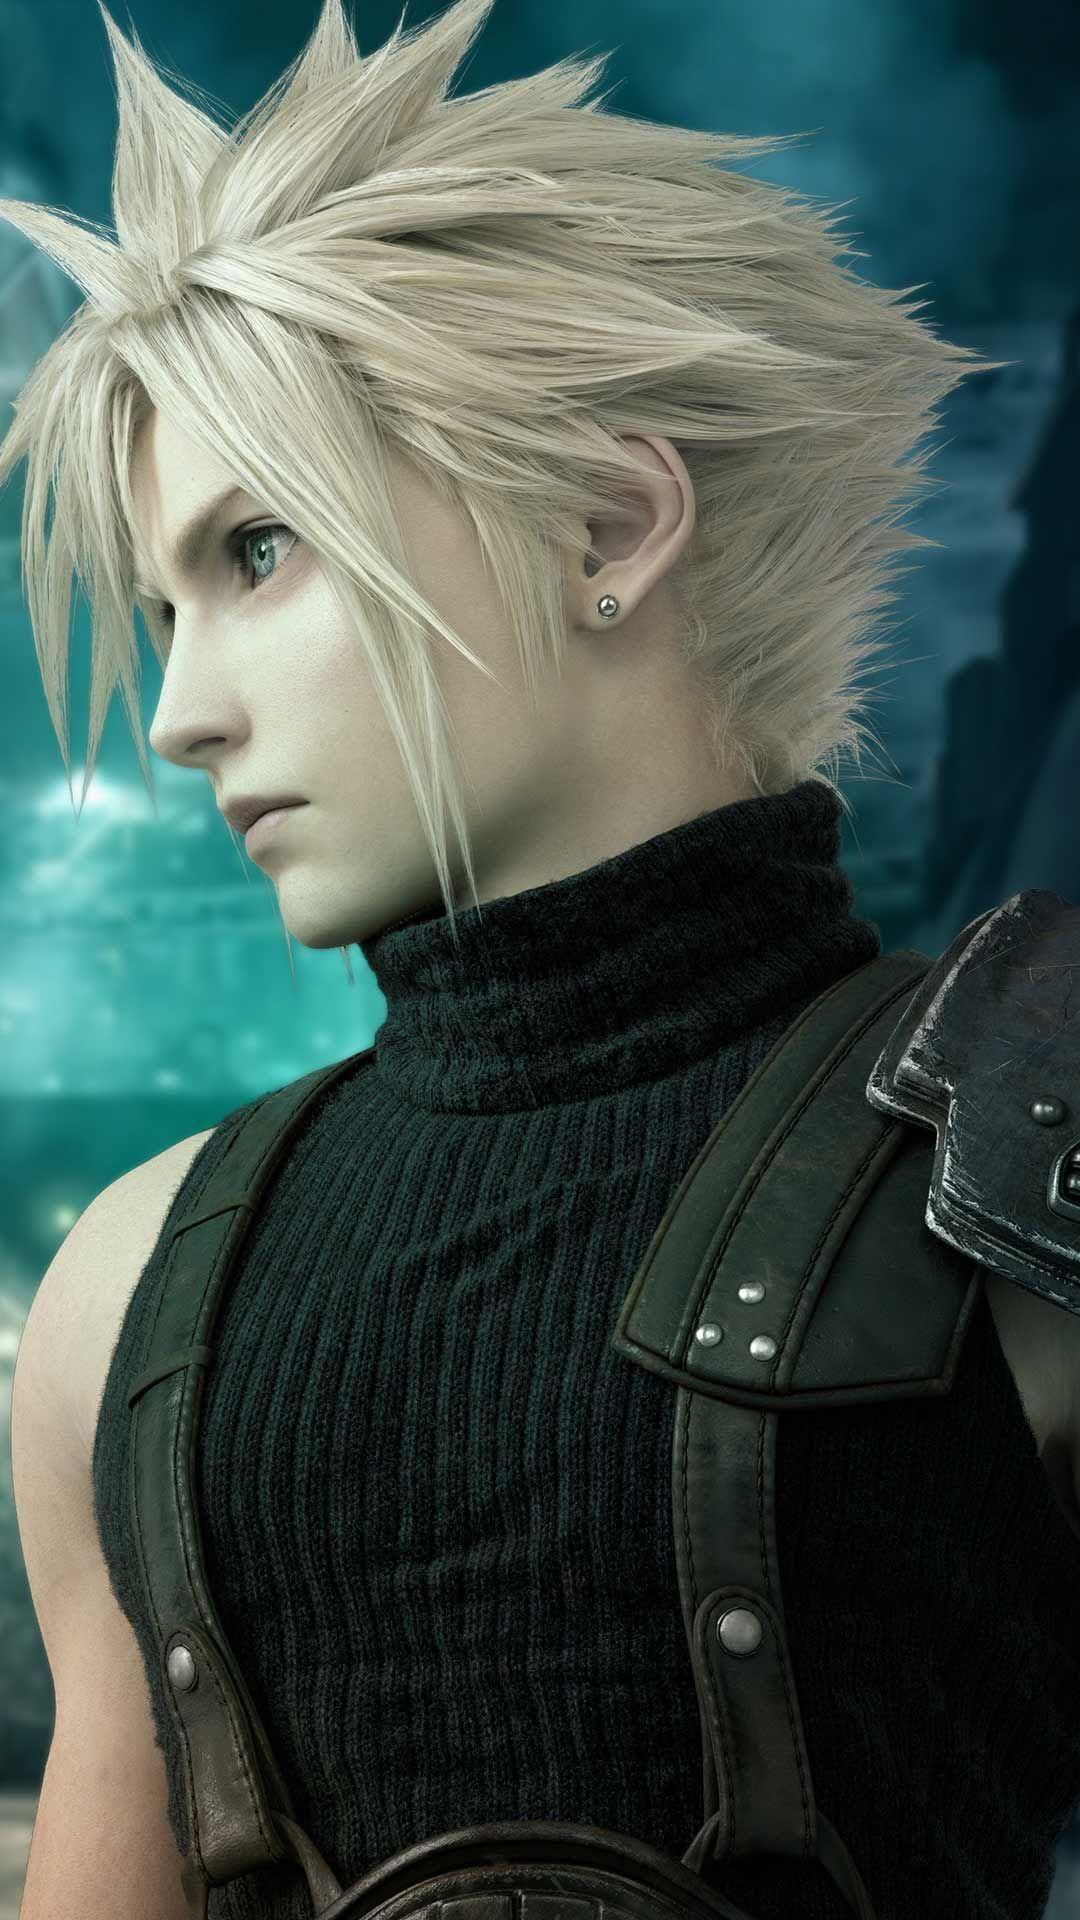 Get Some Final Fantasy 7 Remake Wallpaper Hd Images Of Character Tifa Lockhart And Cloud Strife Also Aerith Sephiroth J V 2020 G Klaud Strajf Poslednyaya Fantaziya Kosplej